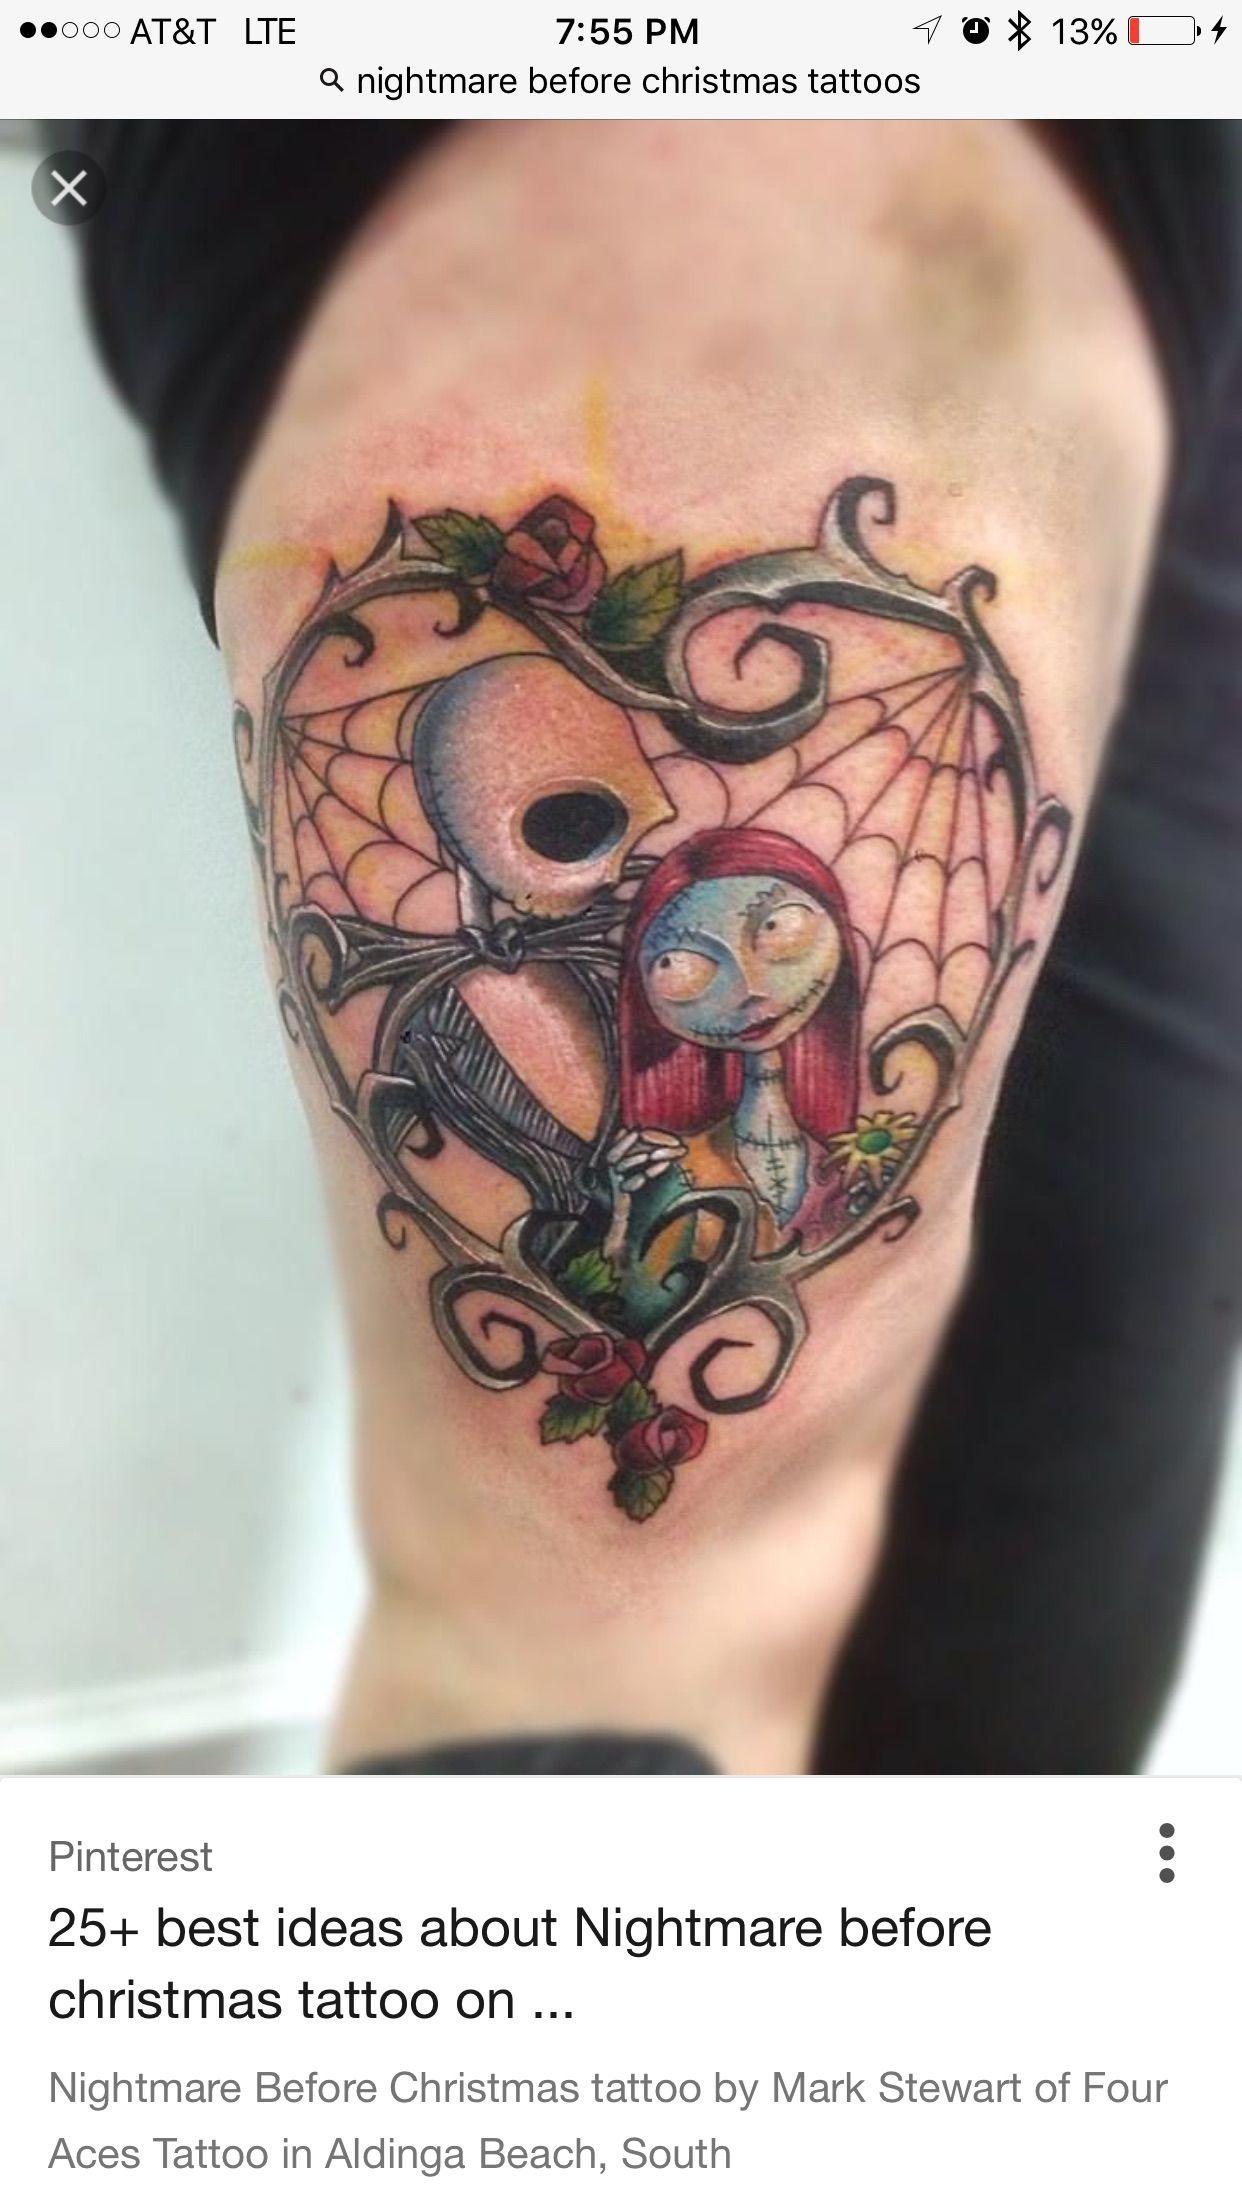 Pin by allison reyes on Tatto | Pinterest | Tattoos, Nightmare ...